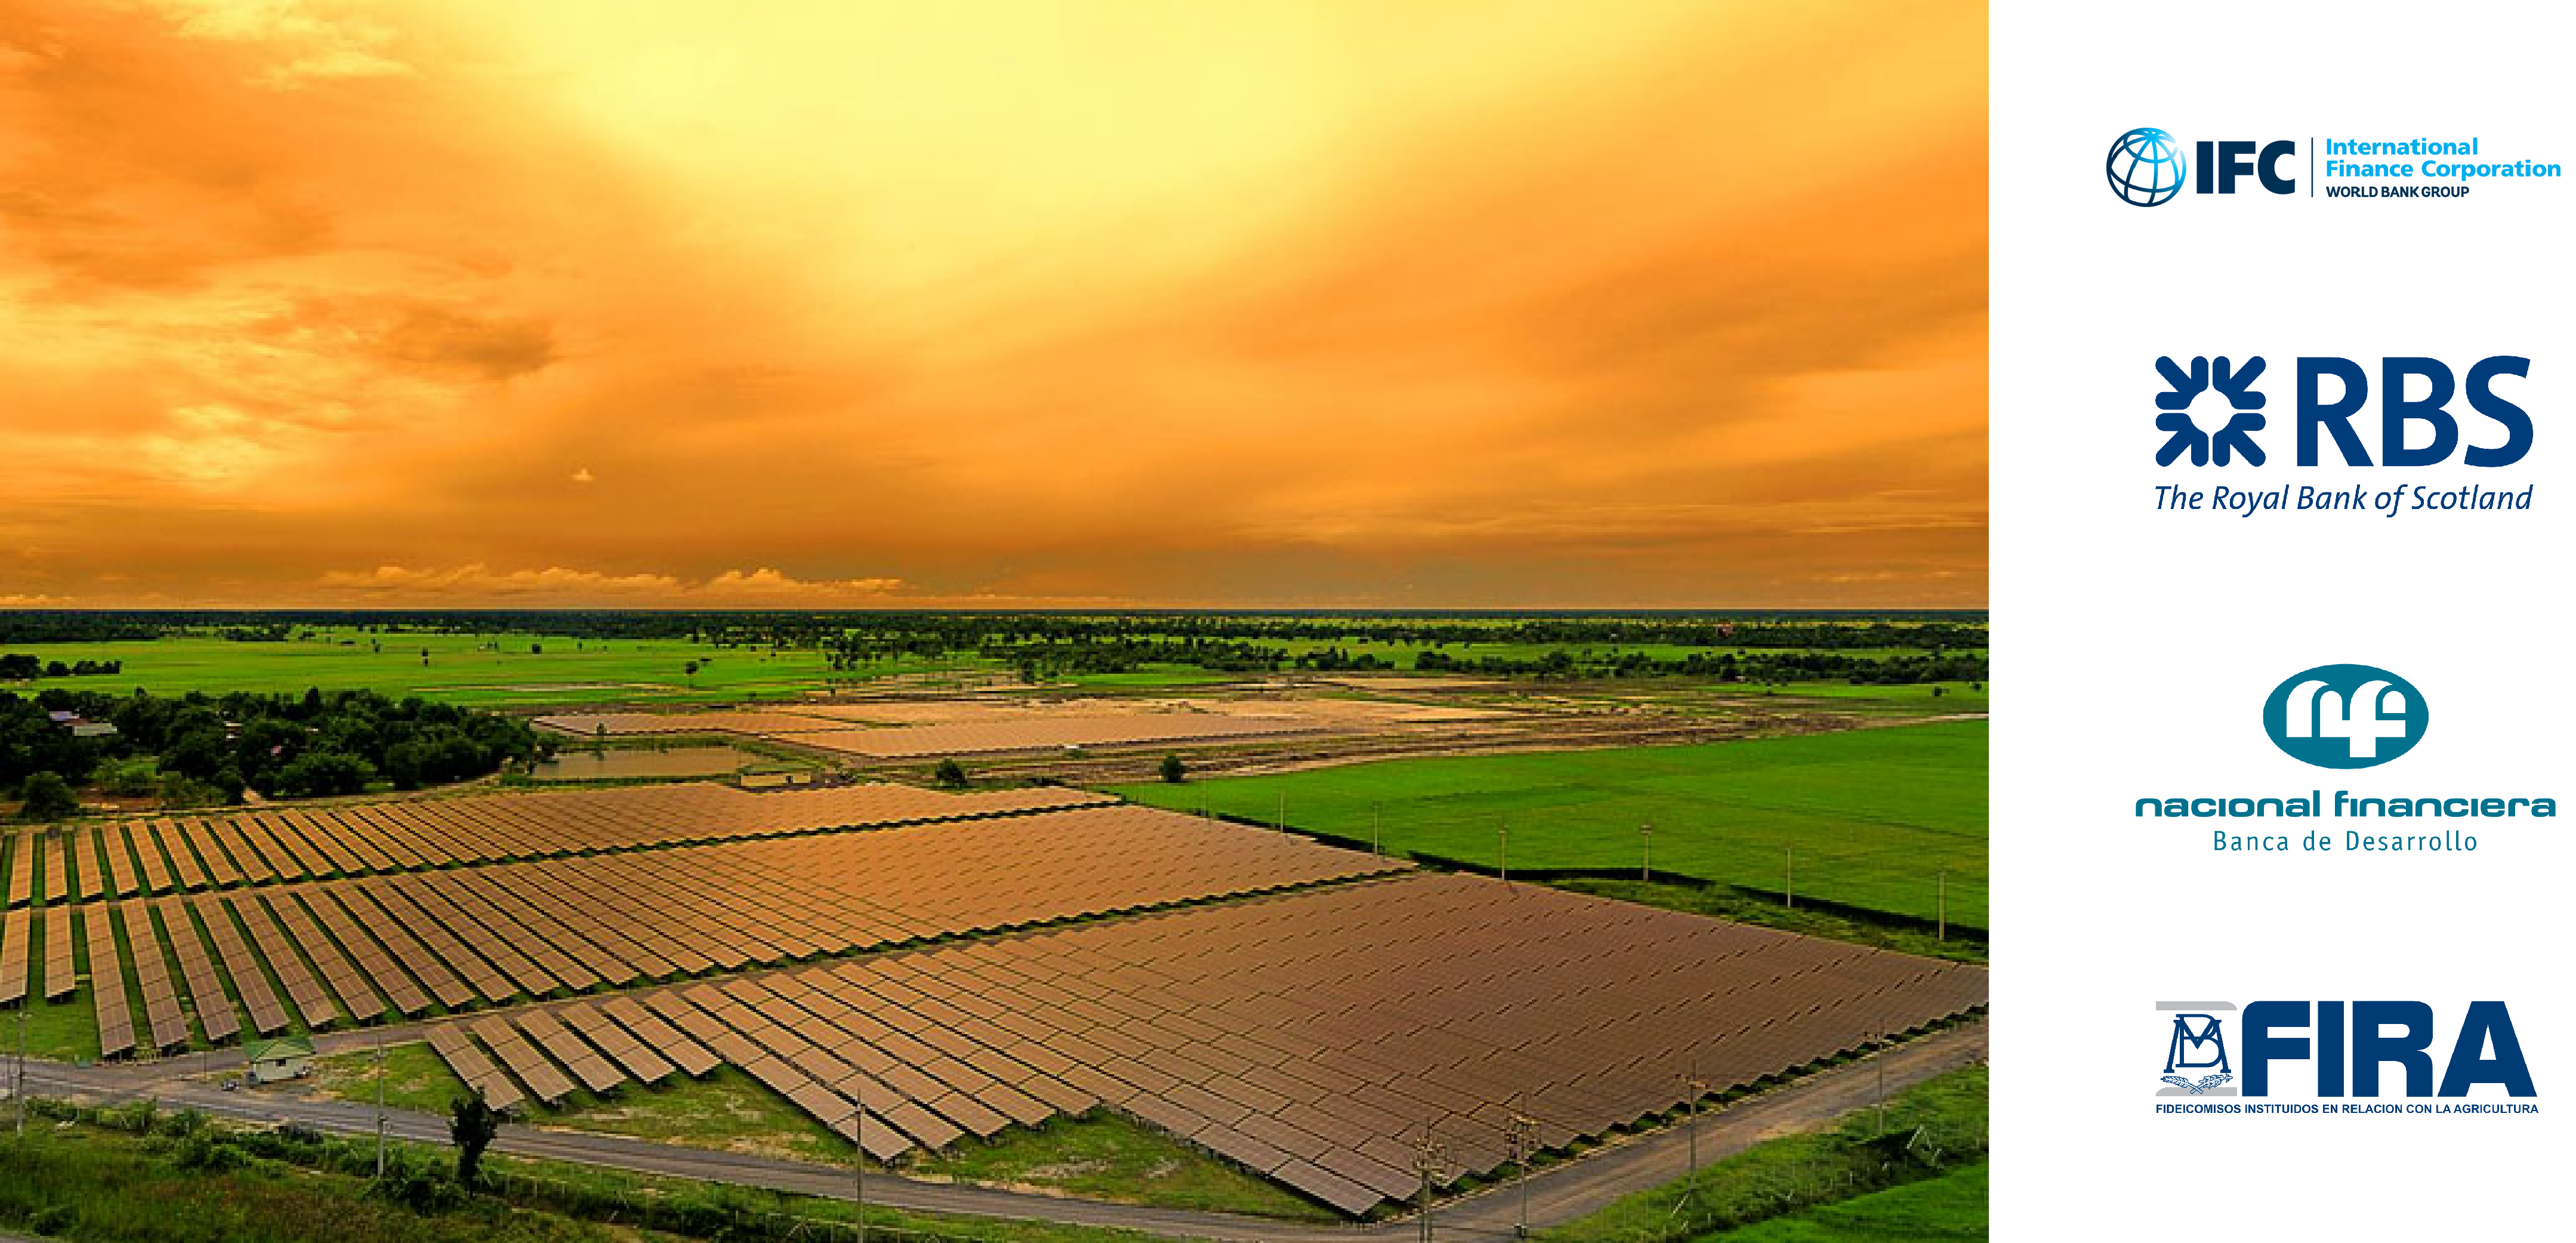 Celdas Solares Gran Escala